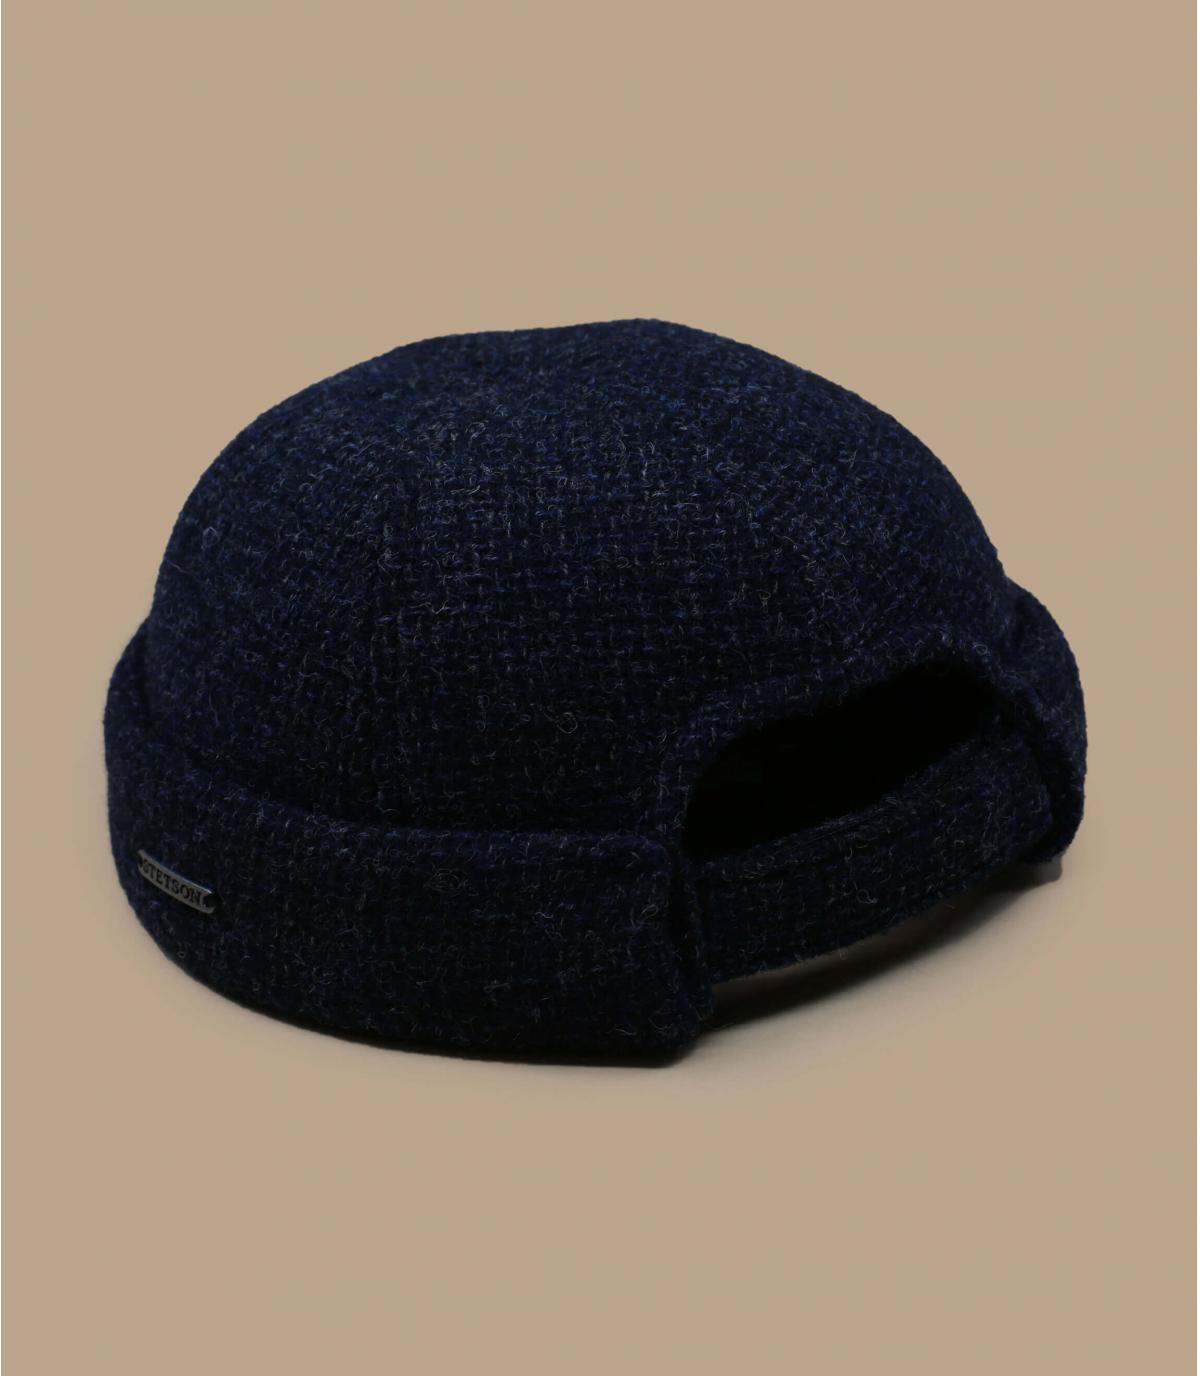 Détails Docker Wool navy - image 3